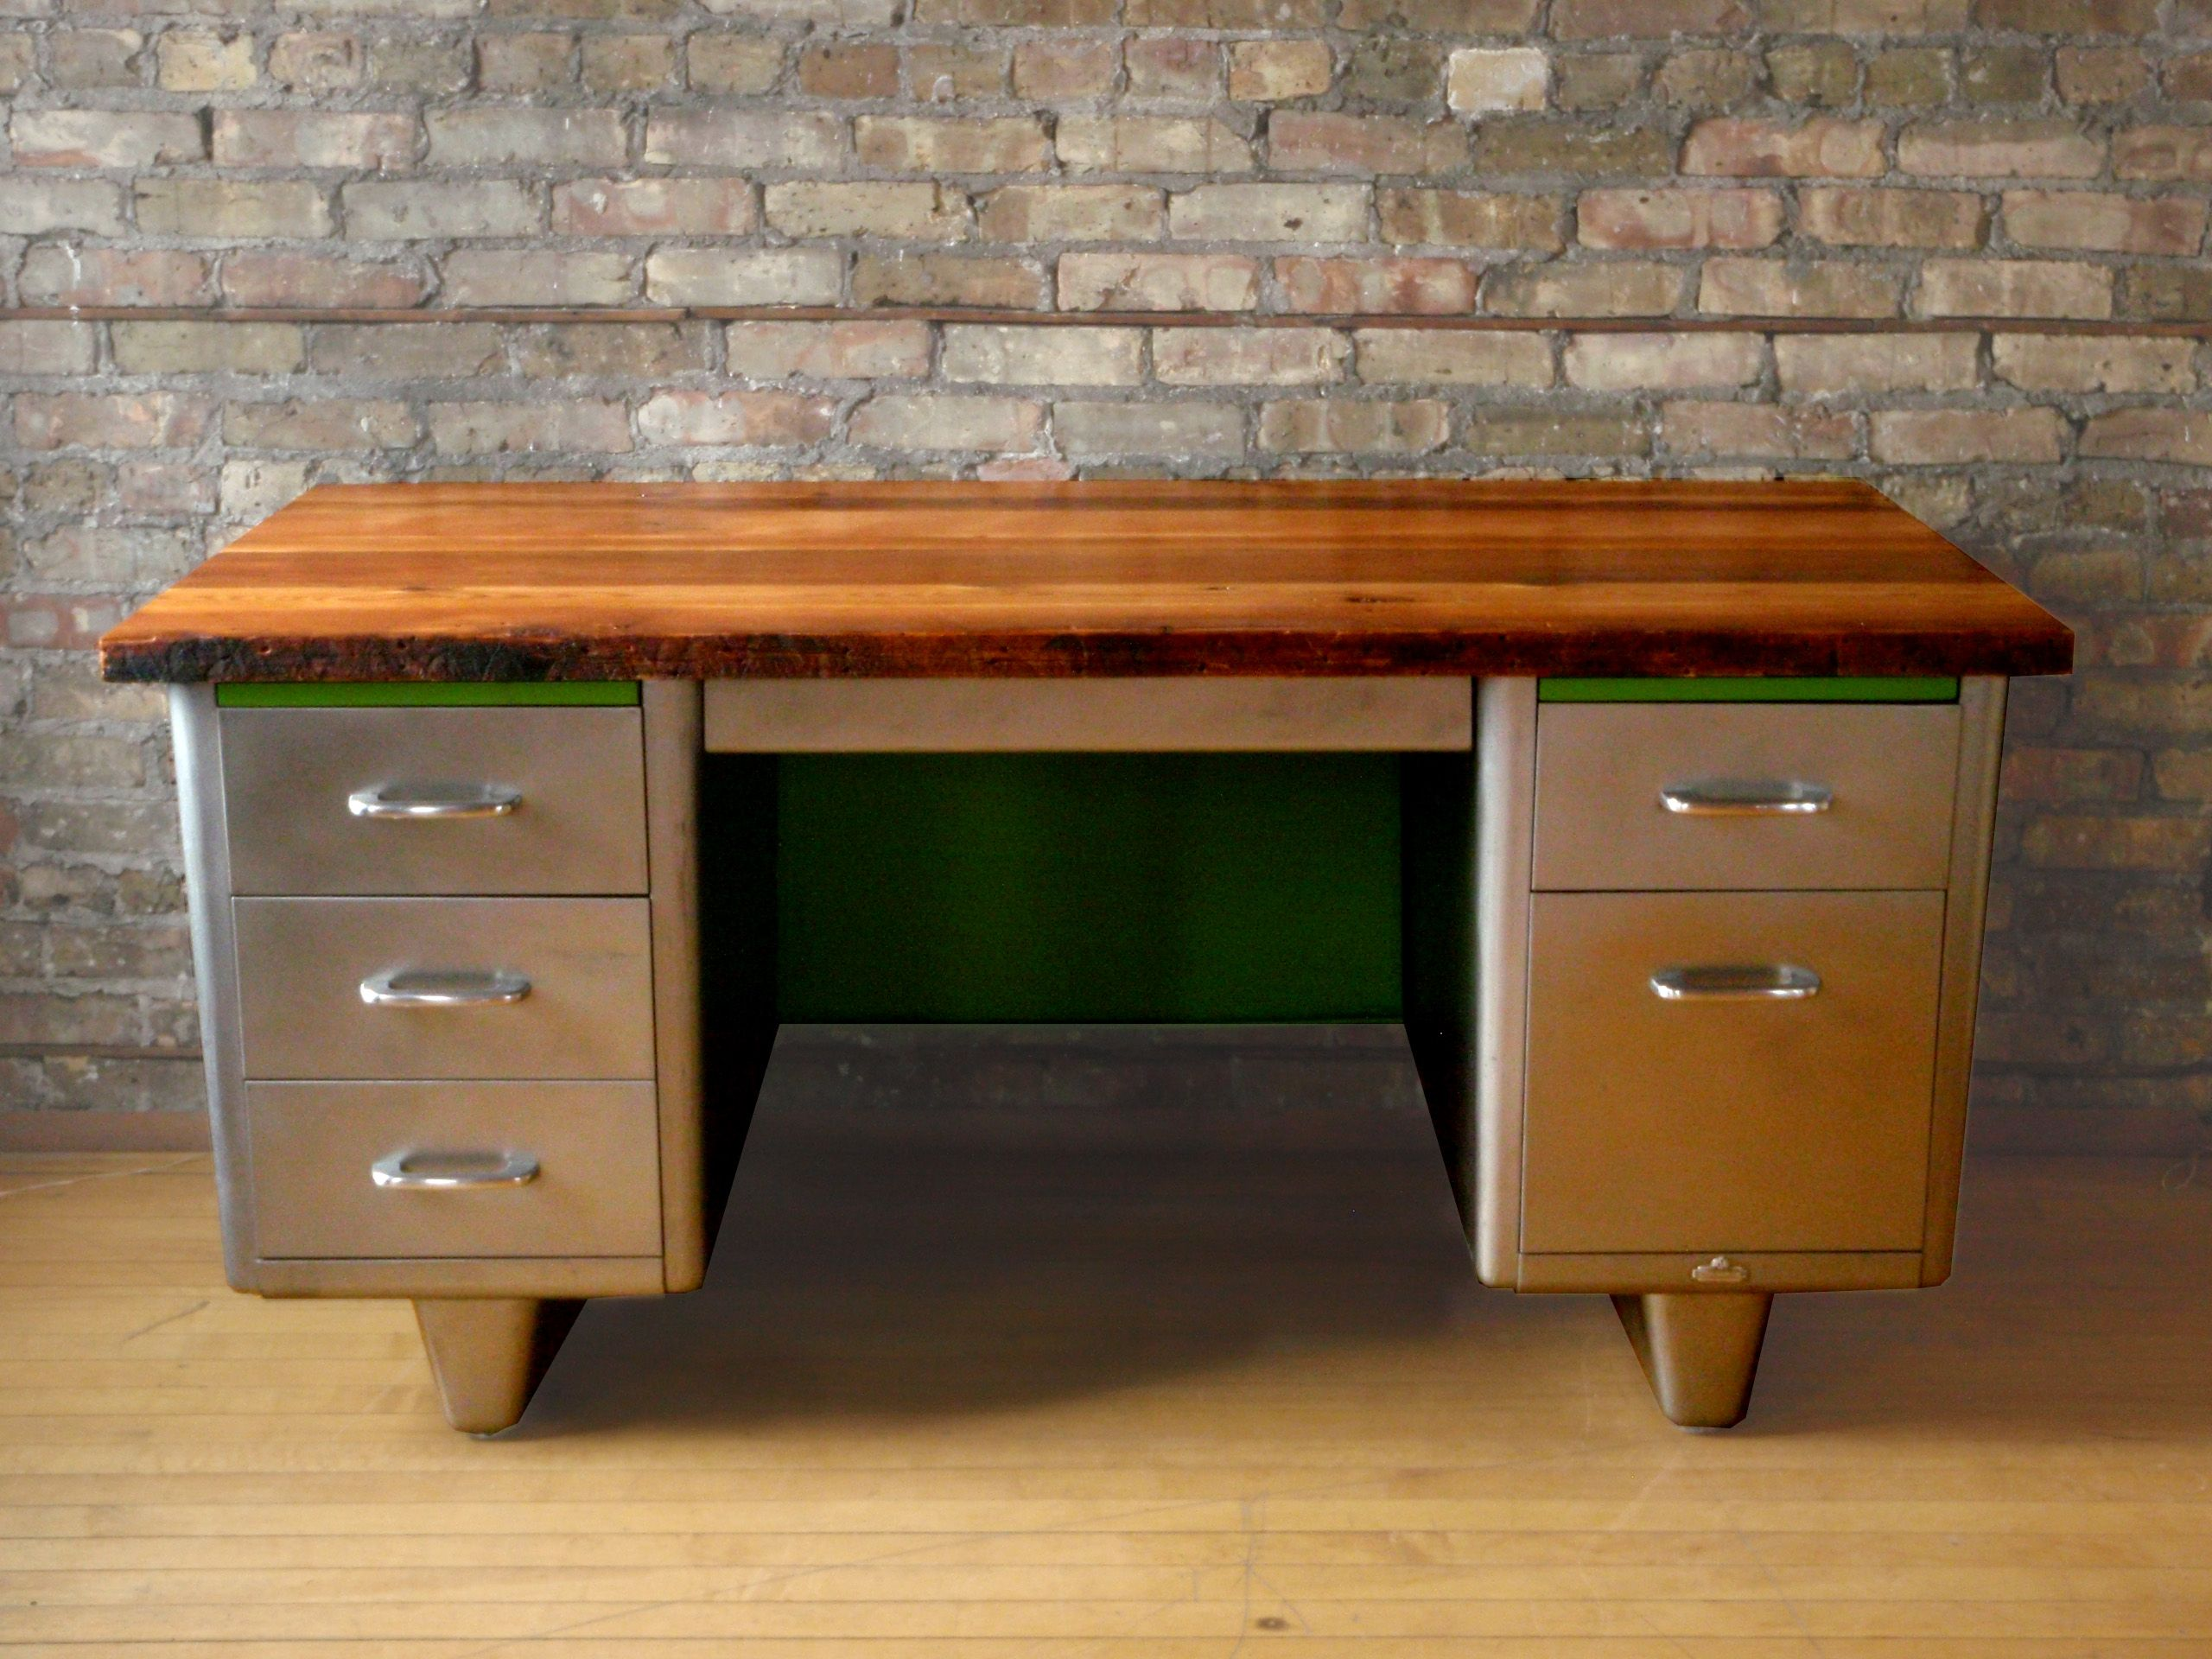 Reclaimed Wood  Steel Desk  furnishings  desk  Metal